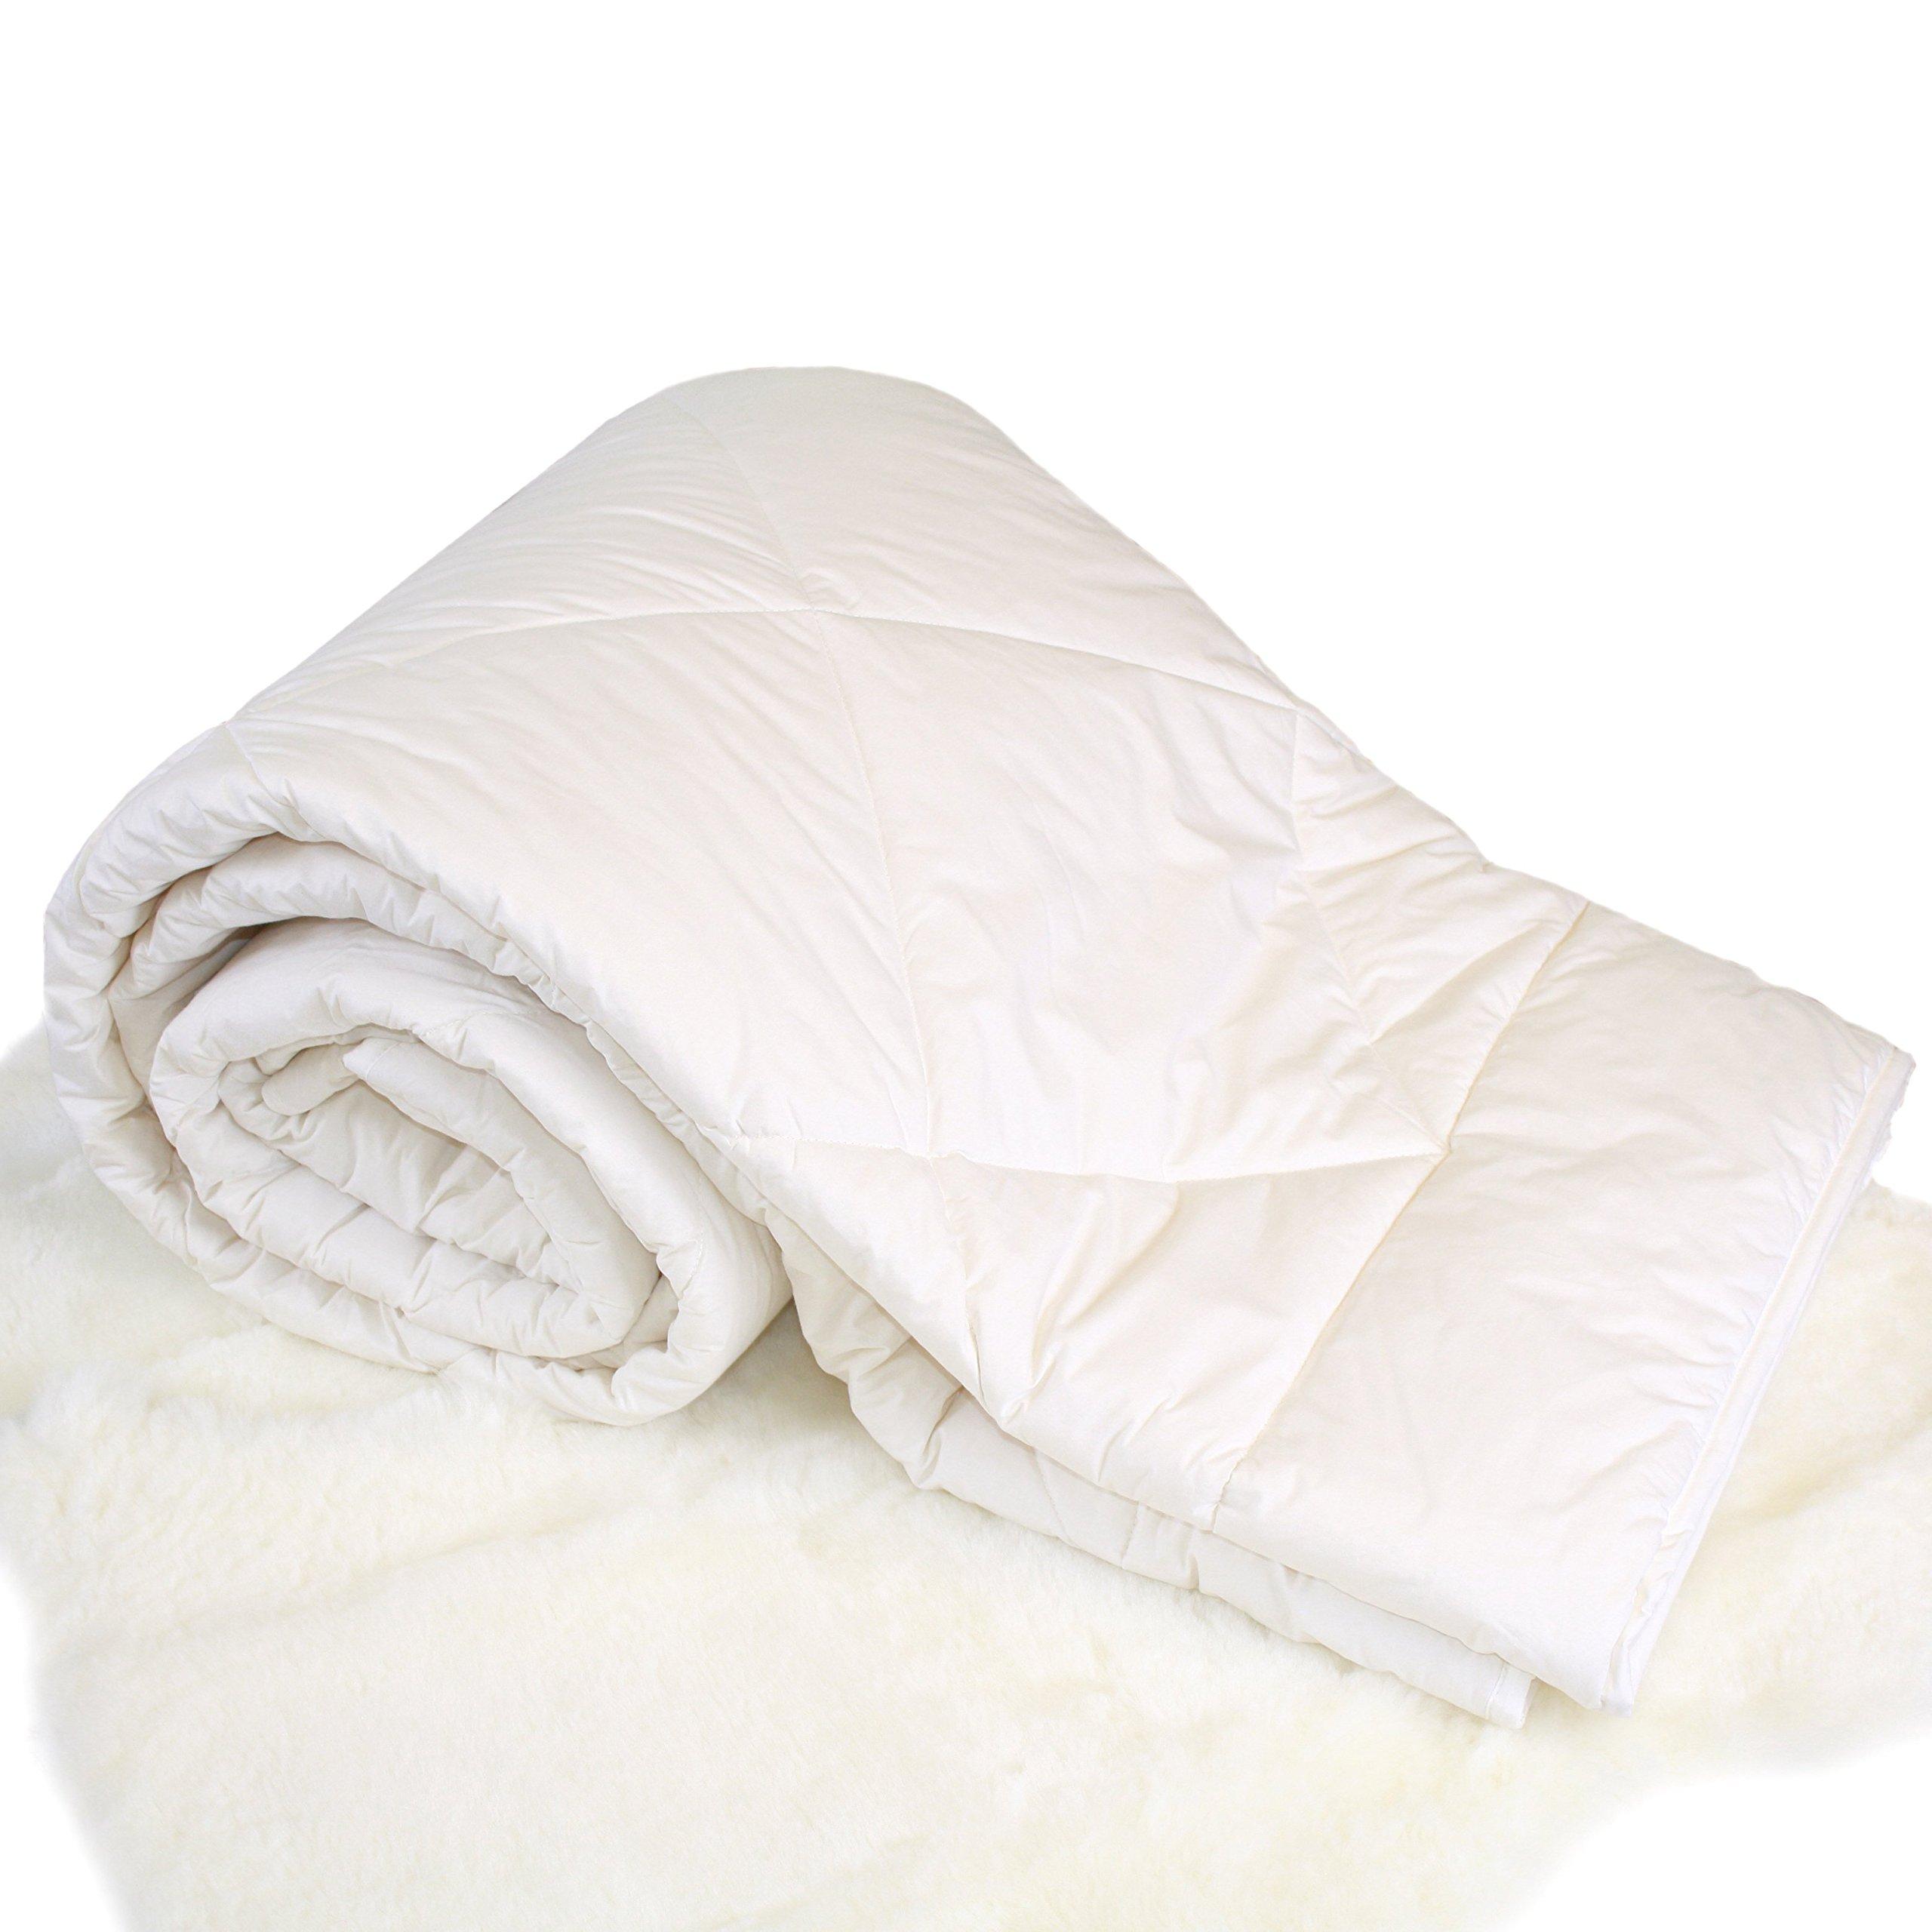 Woolino Premium Australian Washable Wool Comforter, Mid-Weight Crib Wool Duvet Quilt Kids Blanket, Crib/Toddler Bed Size 37''x51'' by Woolino